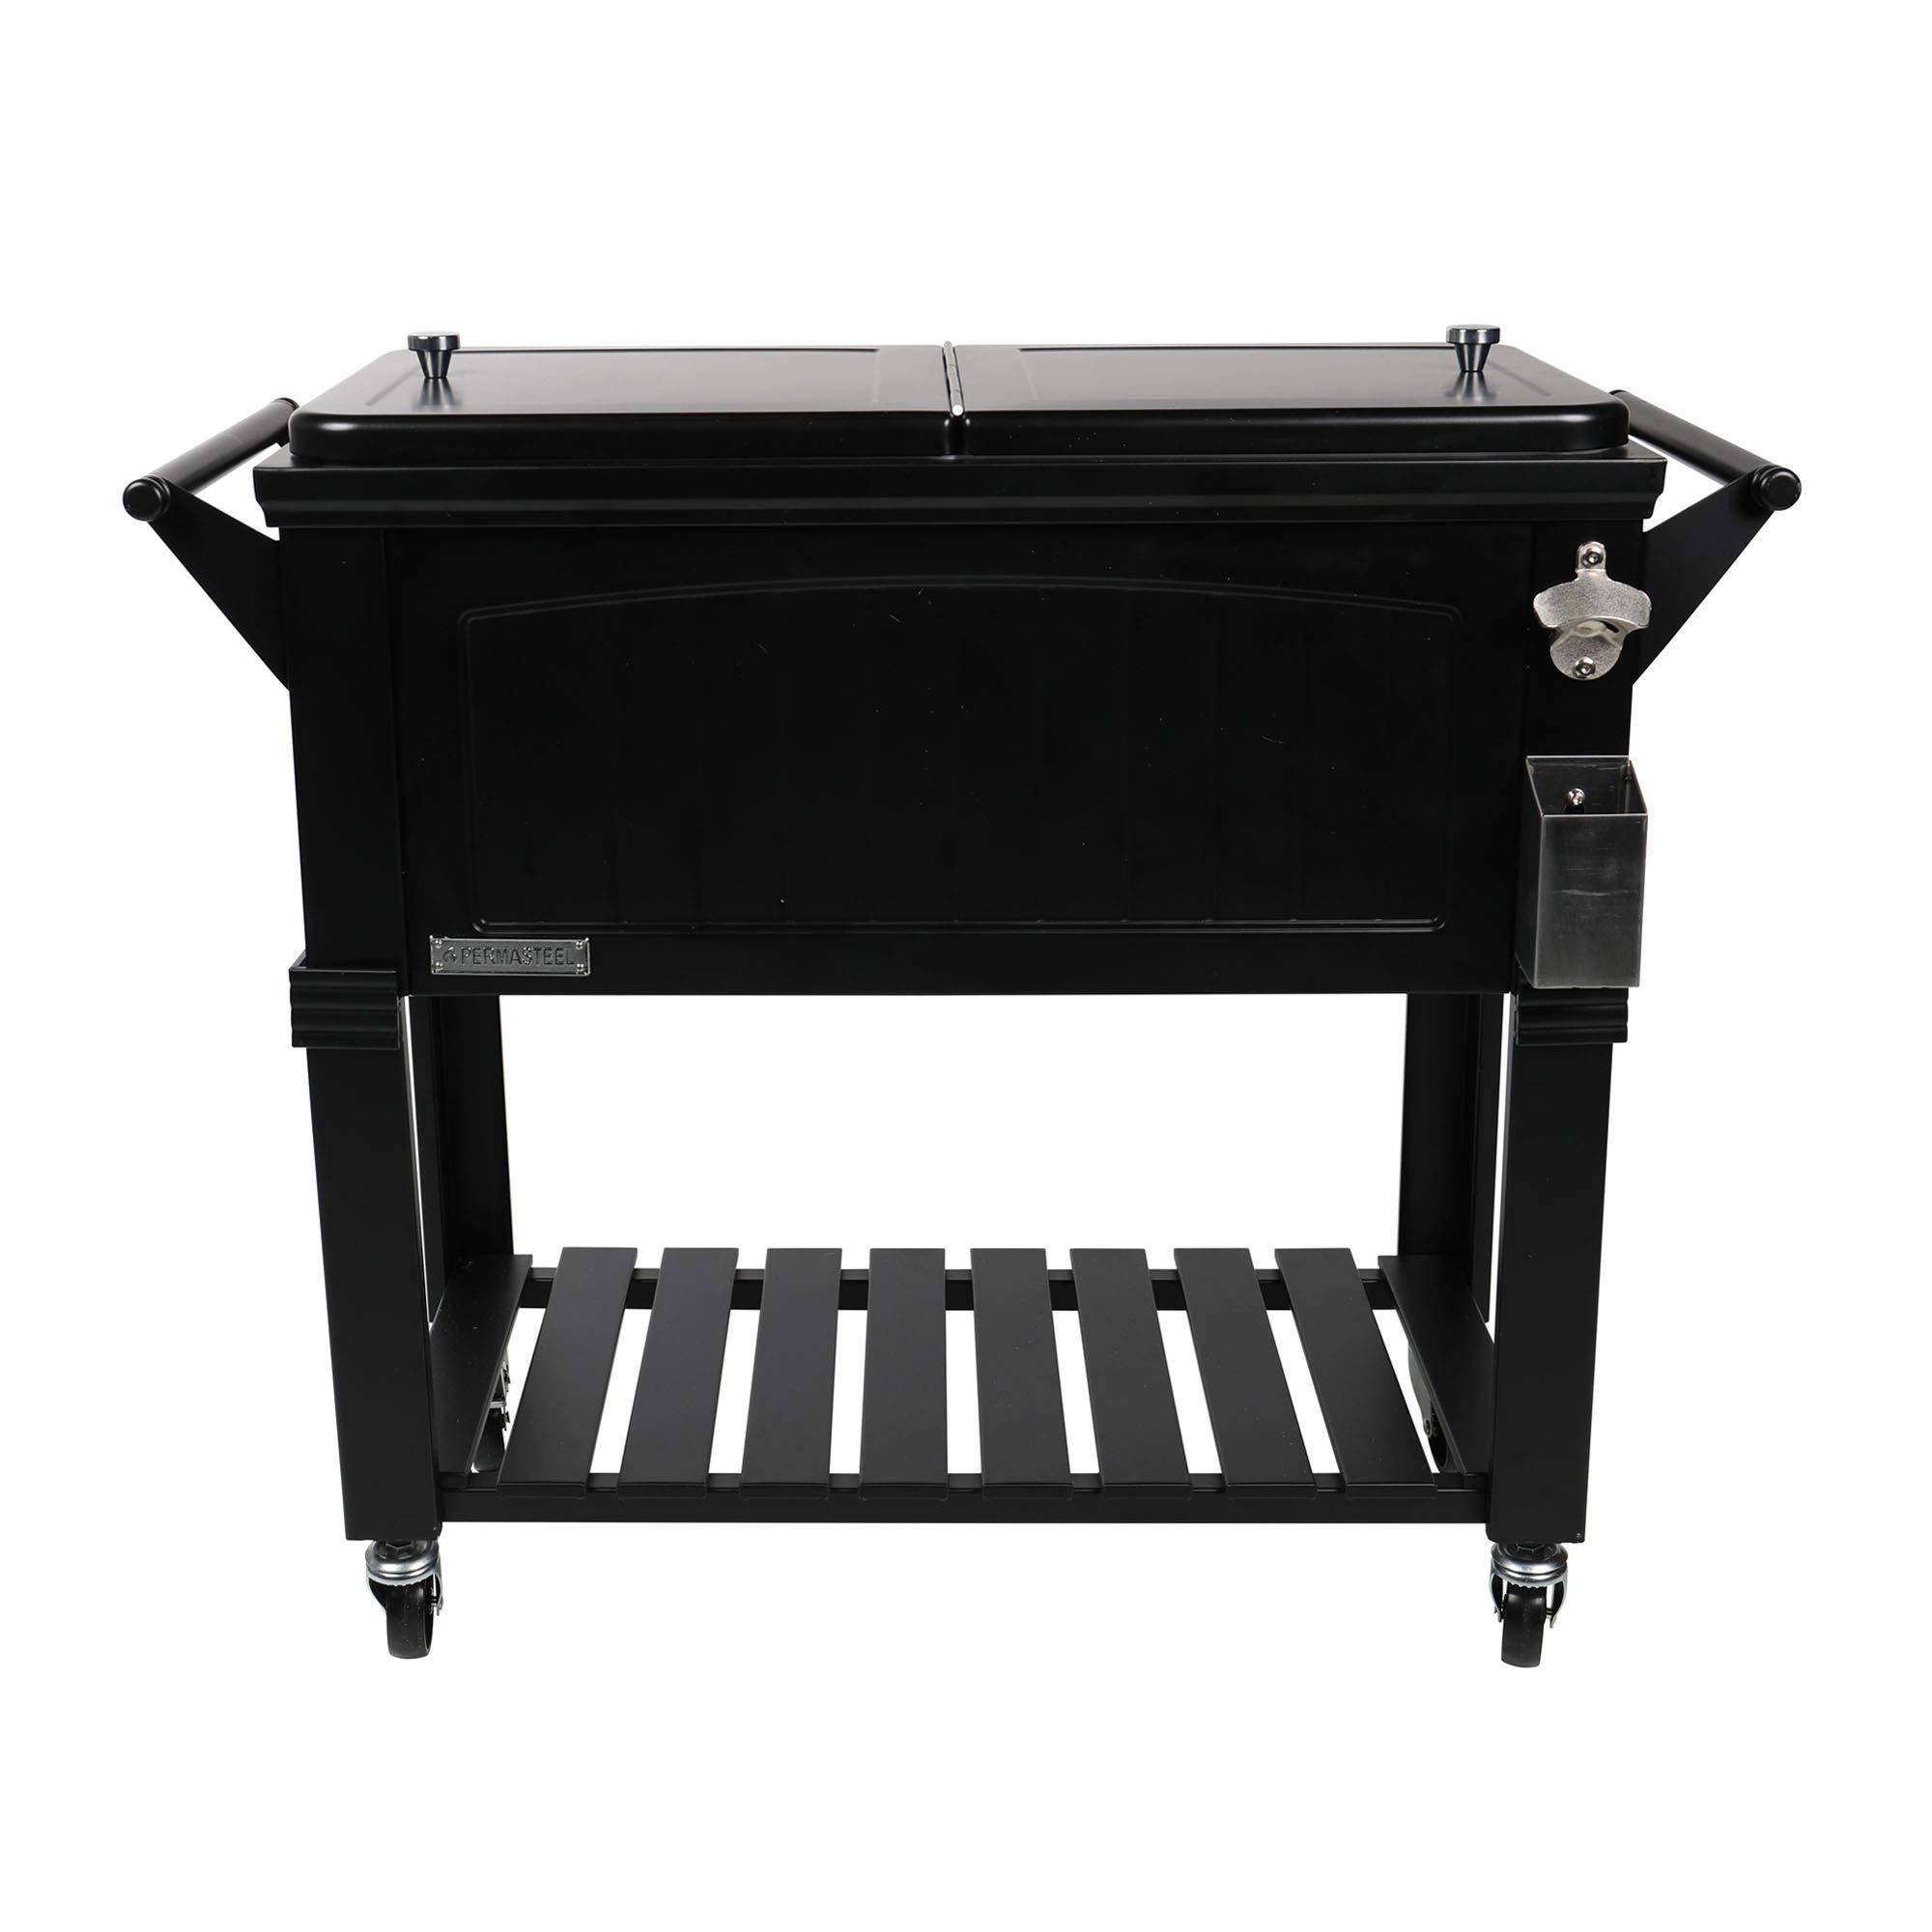 Permasteel PS-203F1-BLK-AM 80 Quart Portable Rolling Patio Cooler, Black by Permasteel